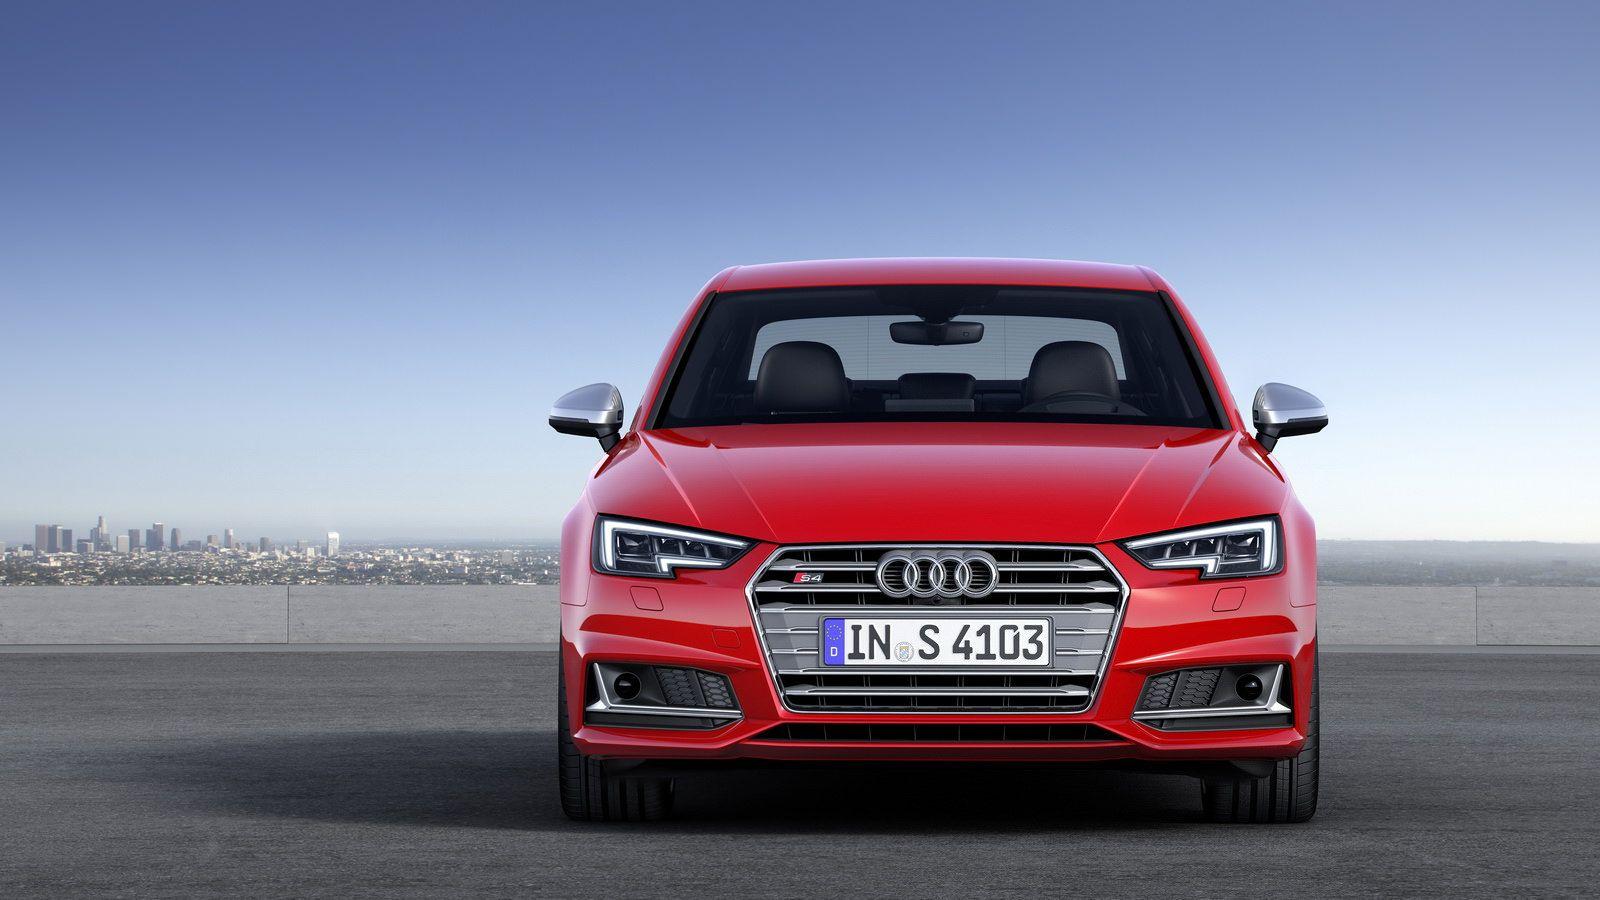 2017 Audi A4 Configurations Audi S4 Audi Audi S4 Avant